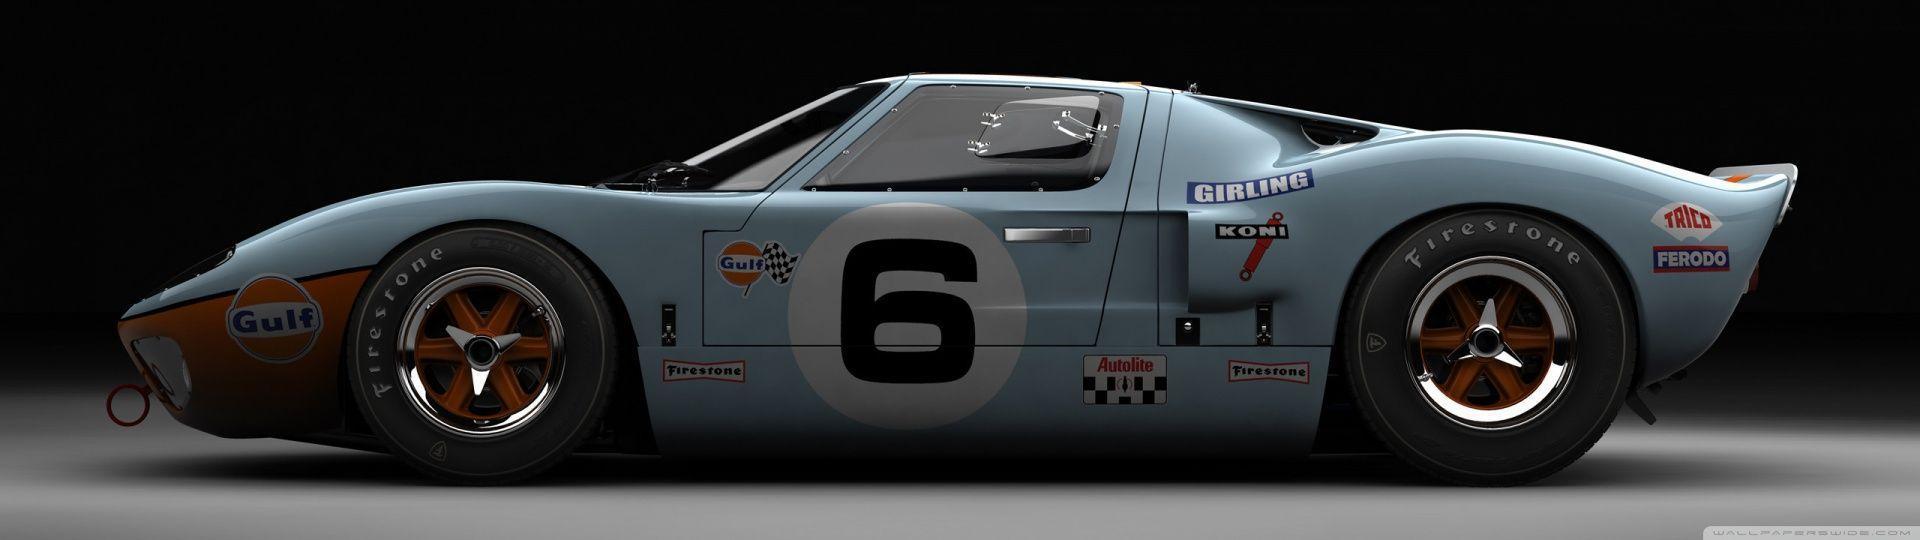 Ford GT40 Le Mans 1969 HD desktop wallpaper : High Definition ...